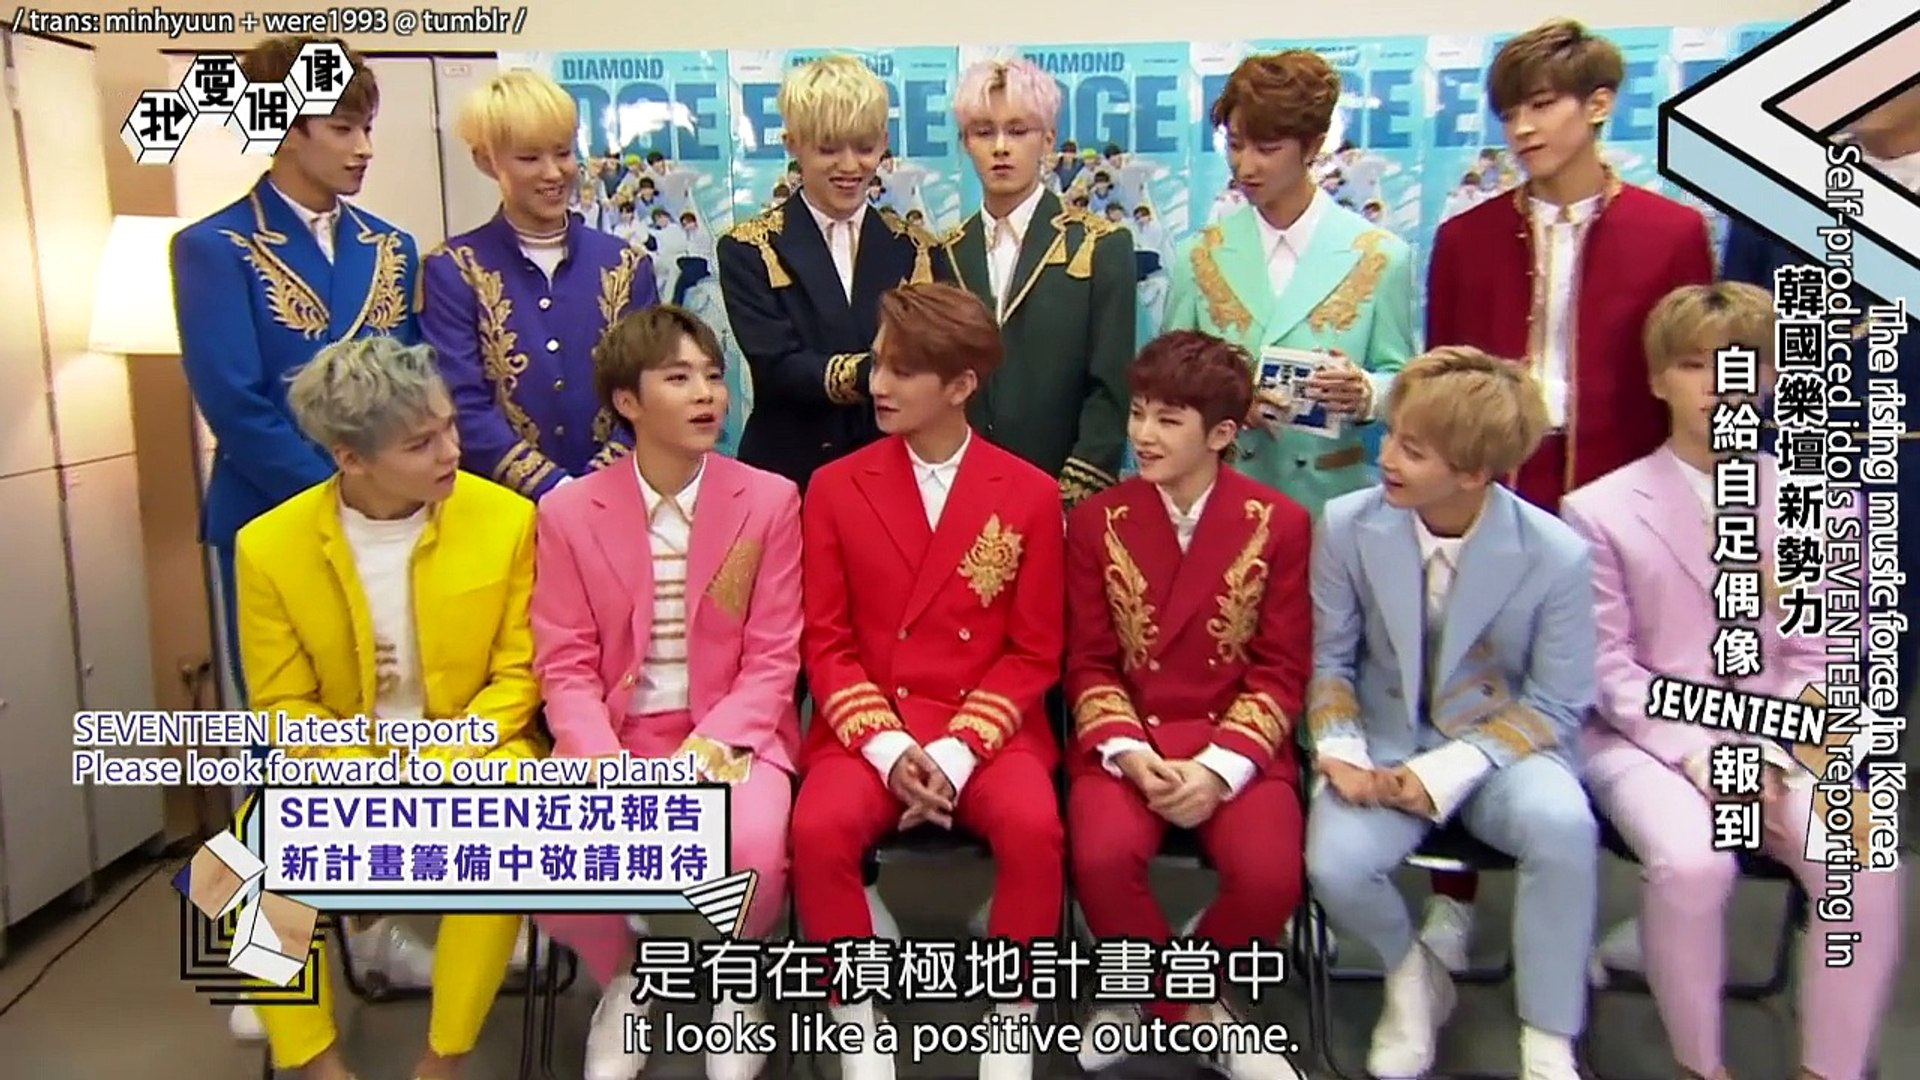 [ENG] 171026 SEVENTEEN Idols of Asia